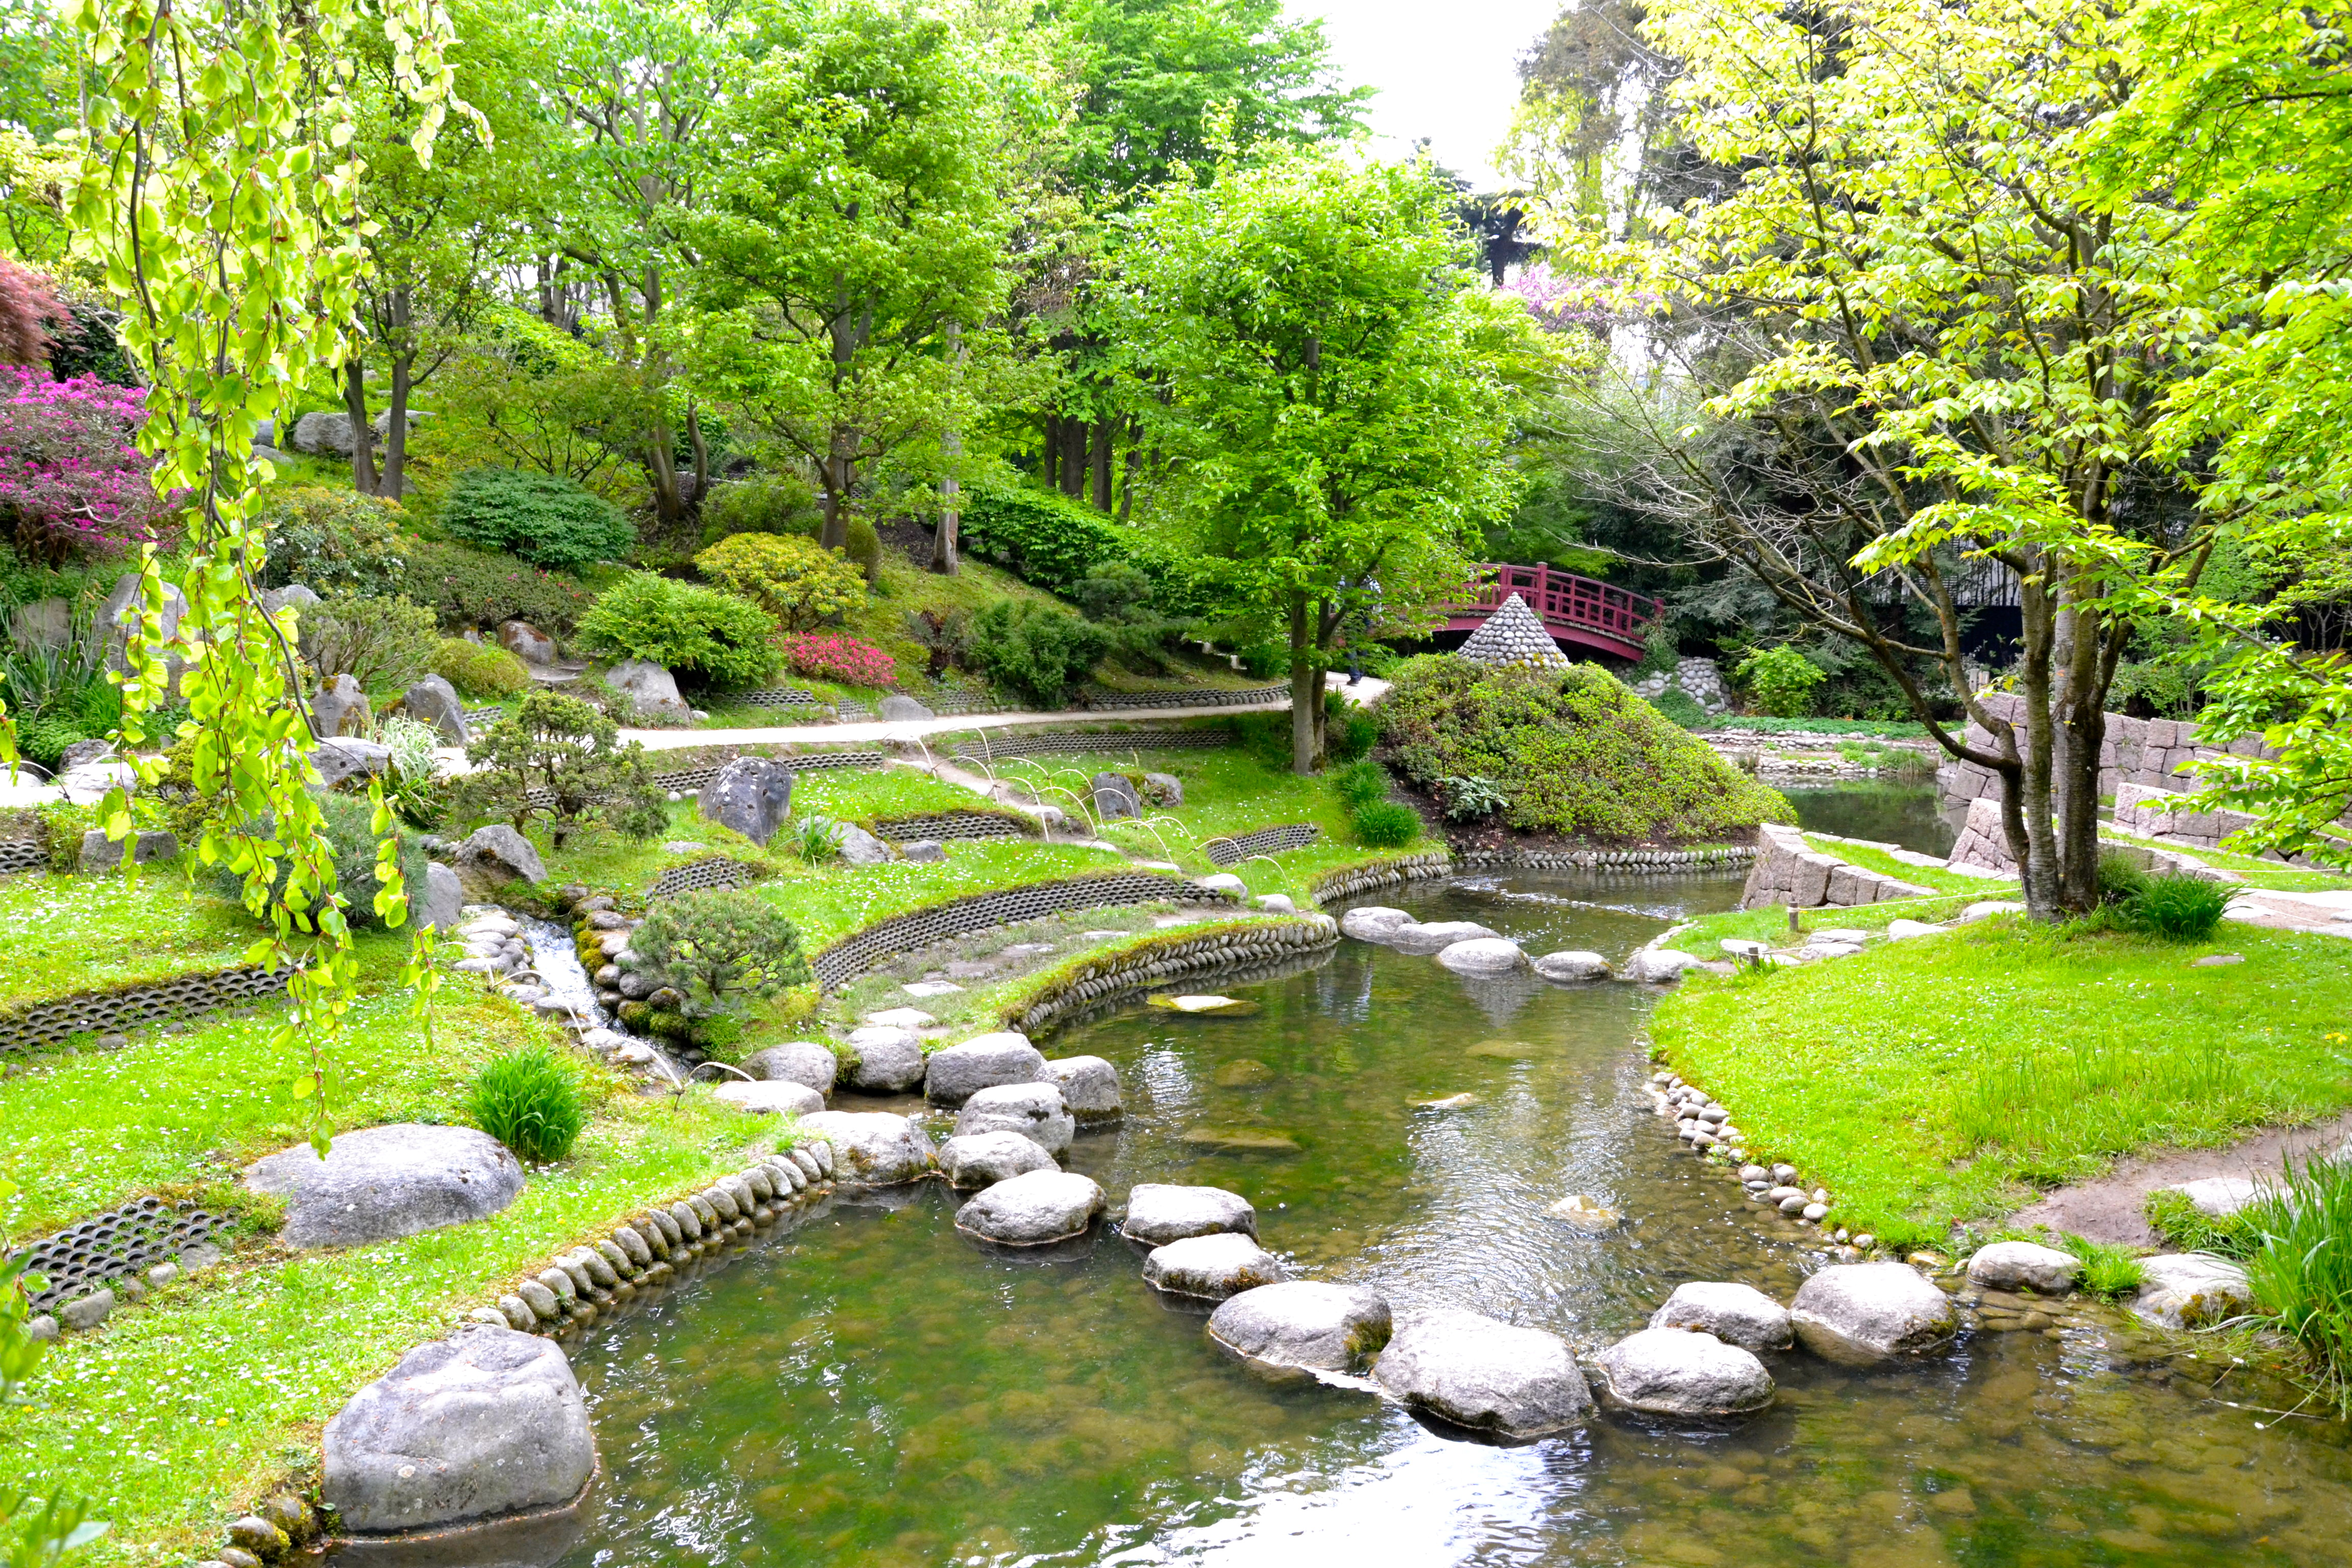 jardin japonais arts et voyages. Black Bedroom Furniture Sets. Home Design Ideas